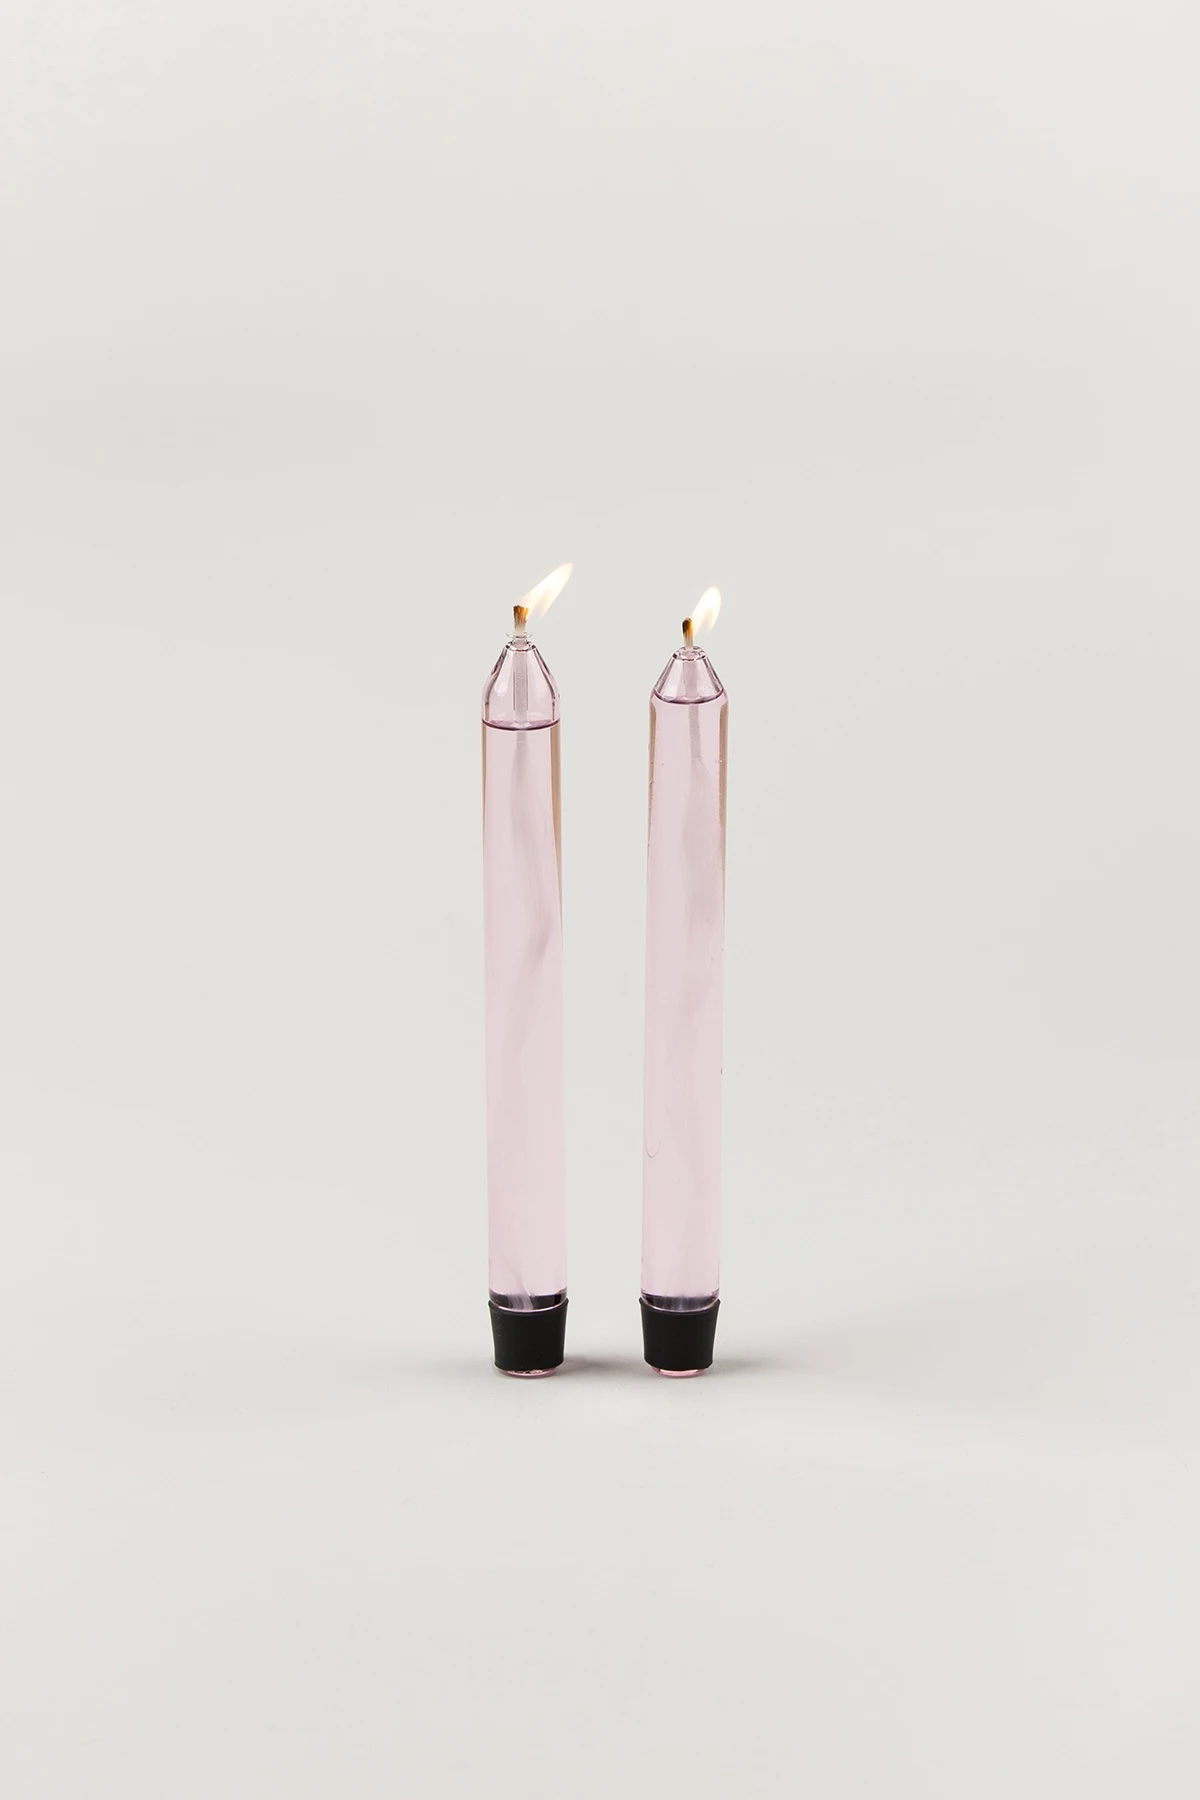 glaslys-olielys-rosa-studio-about